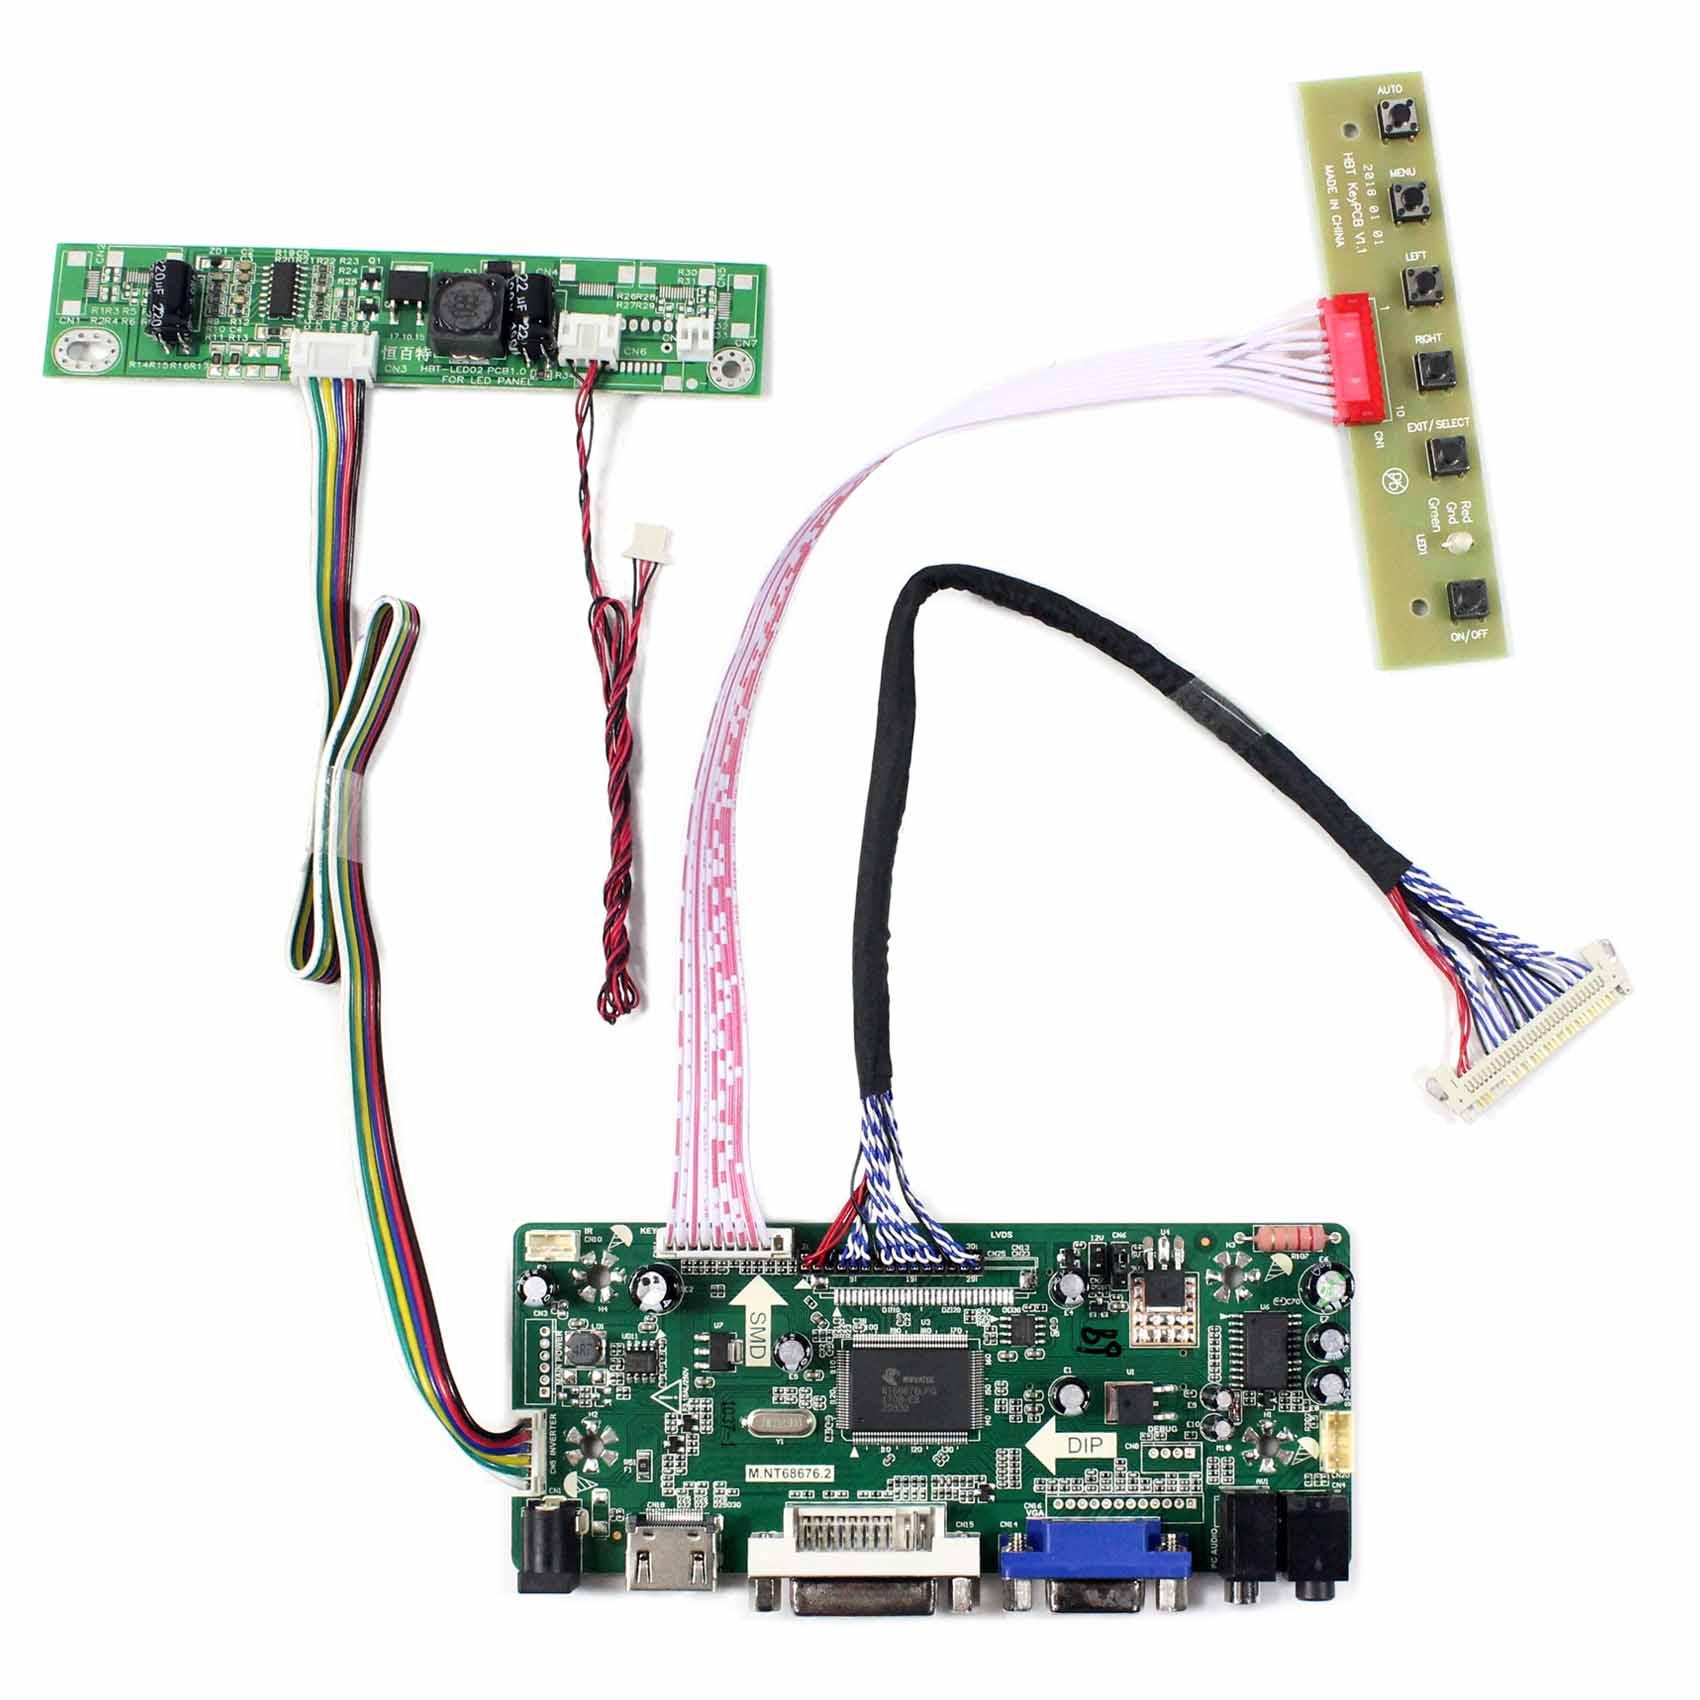 HDMI Controller Board For 23inch  LTM230HT09 LTM230HT10 LTM230HT11 LTM230HT12 HDMI DVI VGA AUDIO LCD Driver Board HDMI Controller Board For 23inch  LTM230HT09 LTM230HT10 LTM230HT11 LTM230HT12 HDMI DVI VGA AUDIO LCD Driver Board